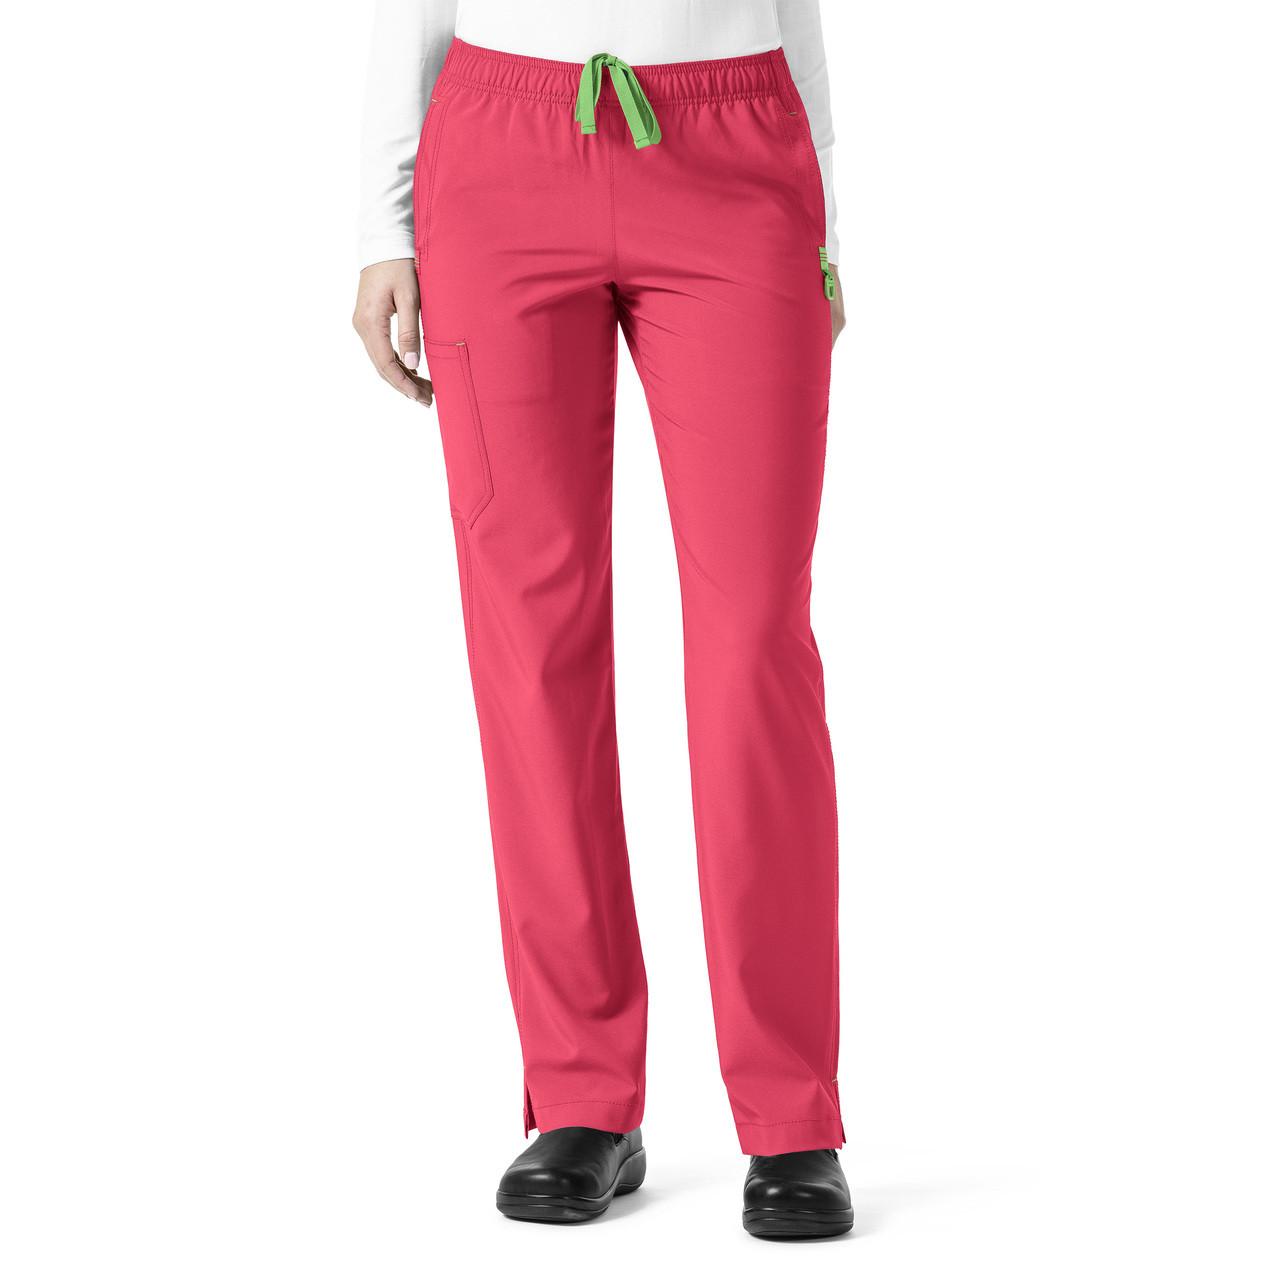 396c853c101 (C52510P) Carhartt Cross-Flex Full Elastic Slim Leg Scrub Pant (Petite) ...